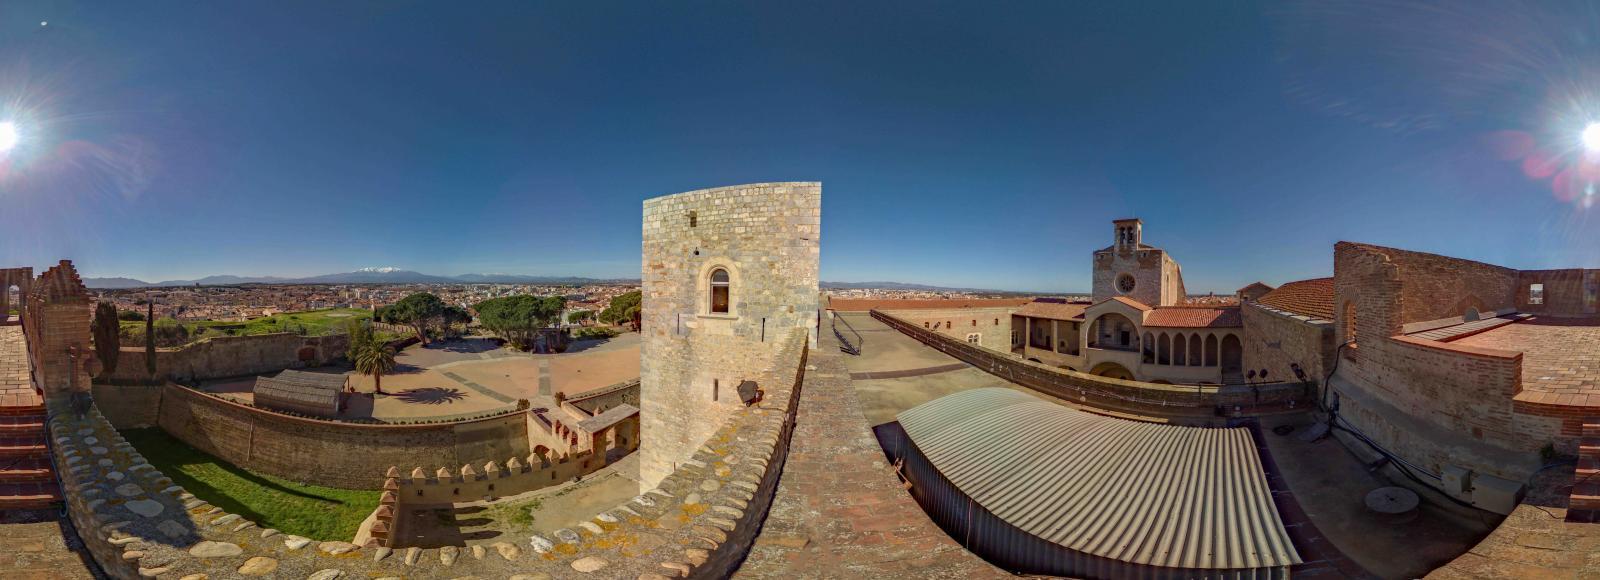 Palais des Rois de Majorque 360°